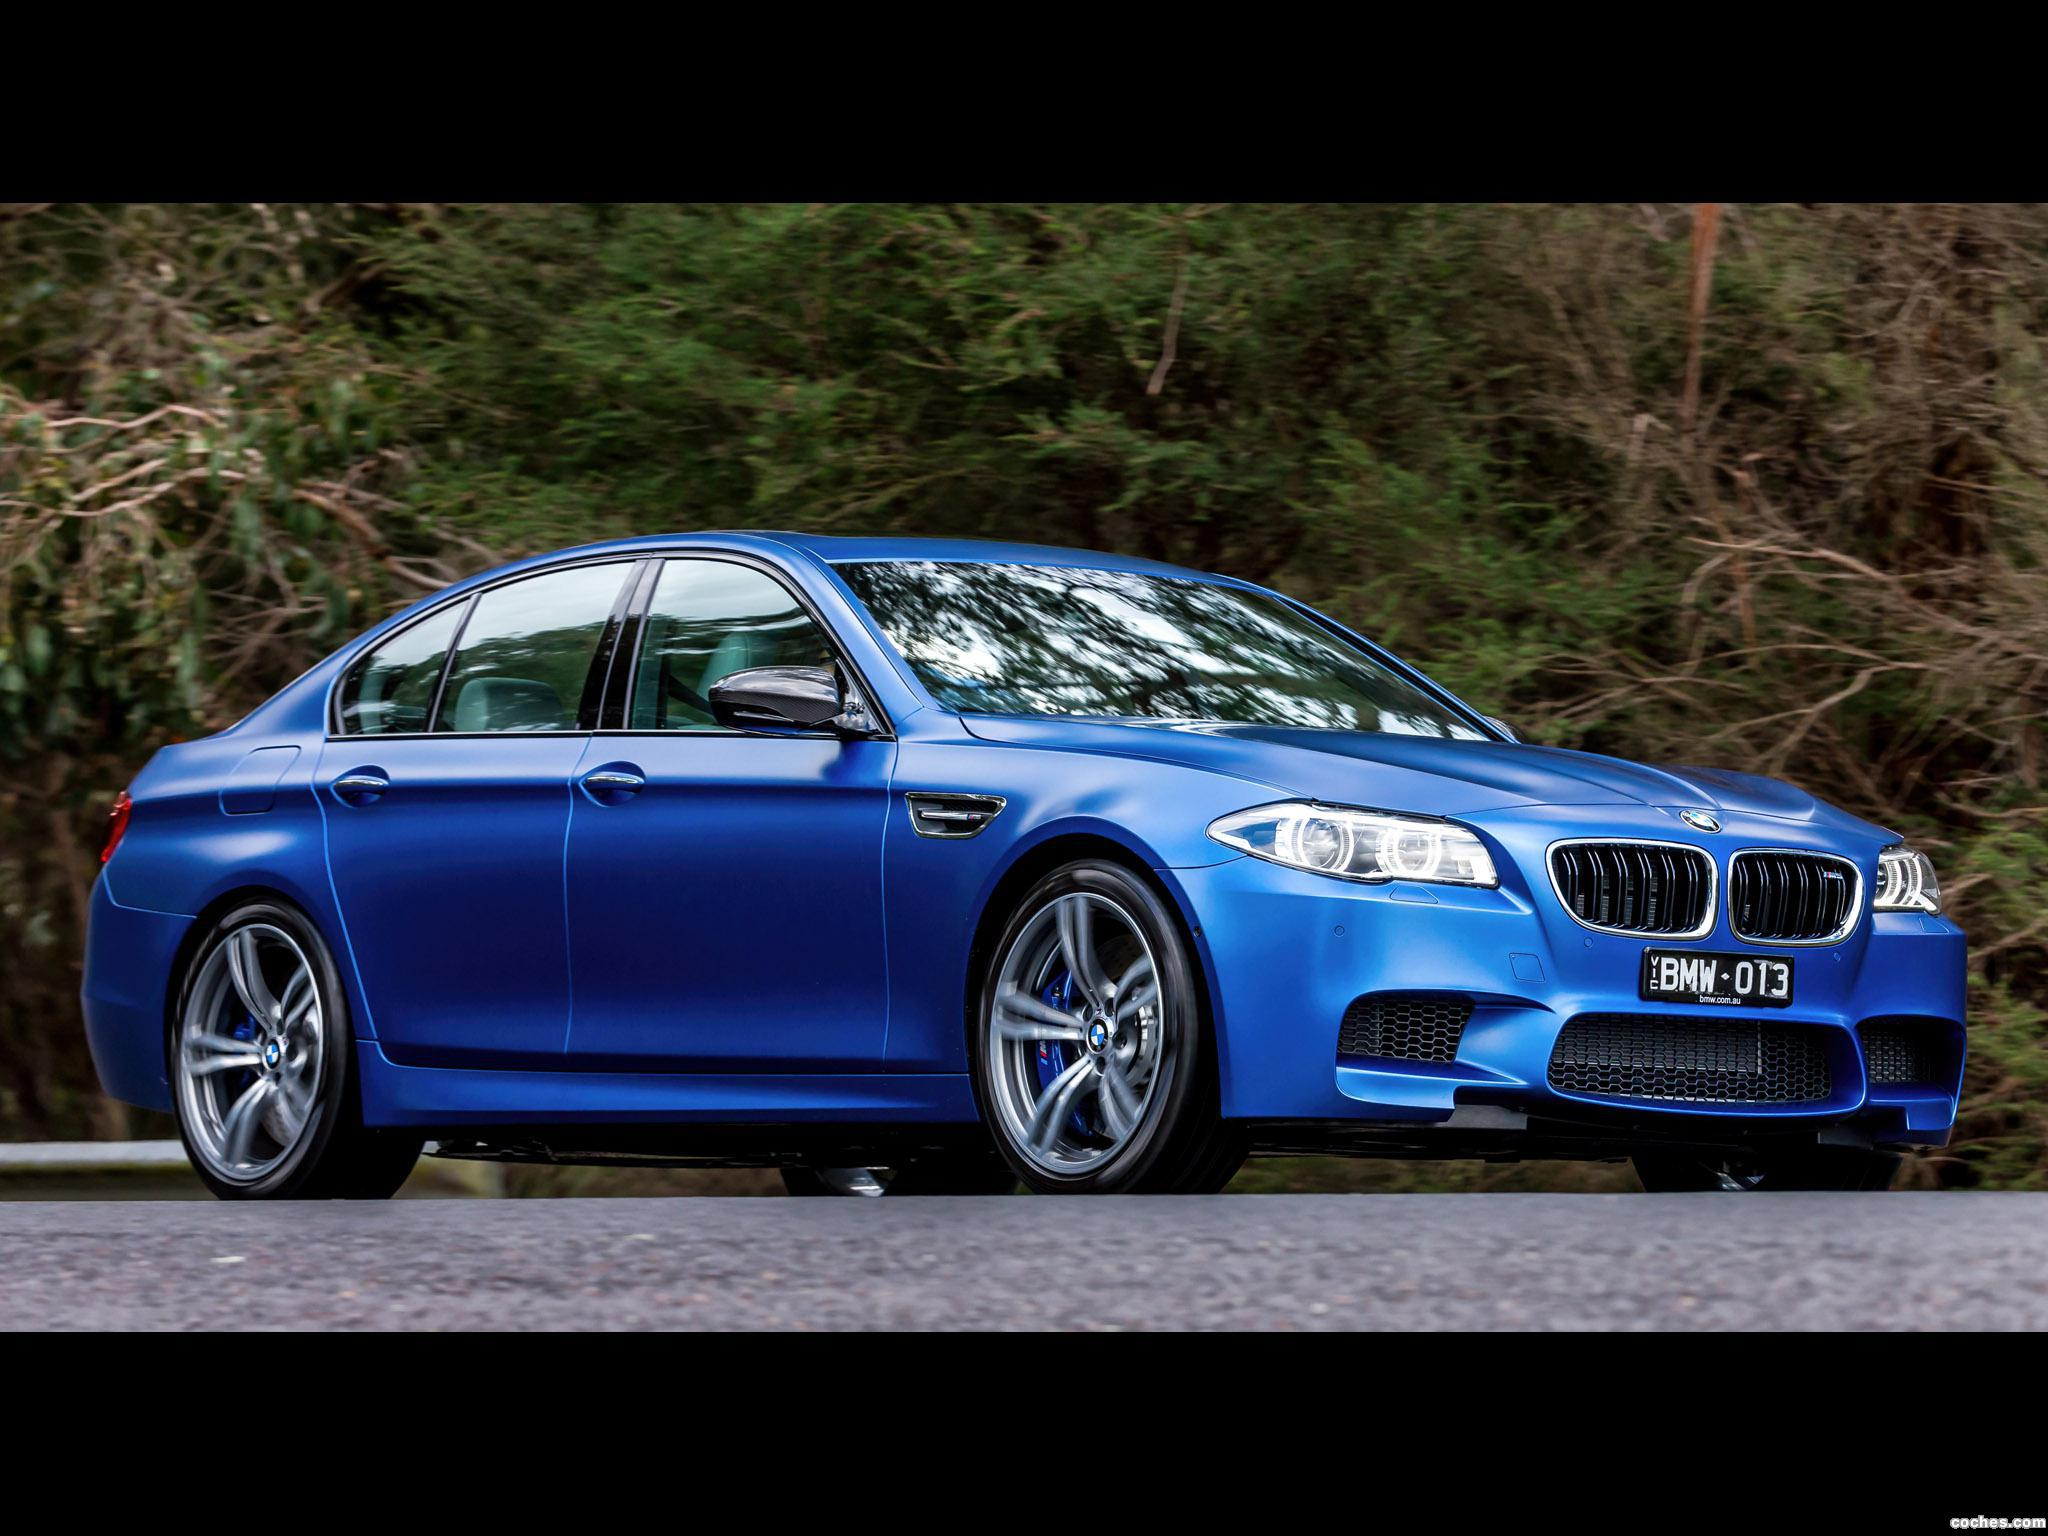 Foto 5 de BMW M5 Pure Edition F10 2015